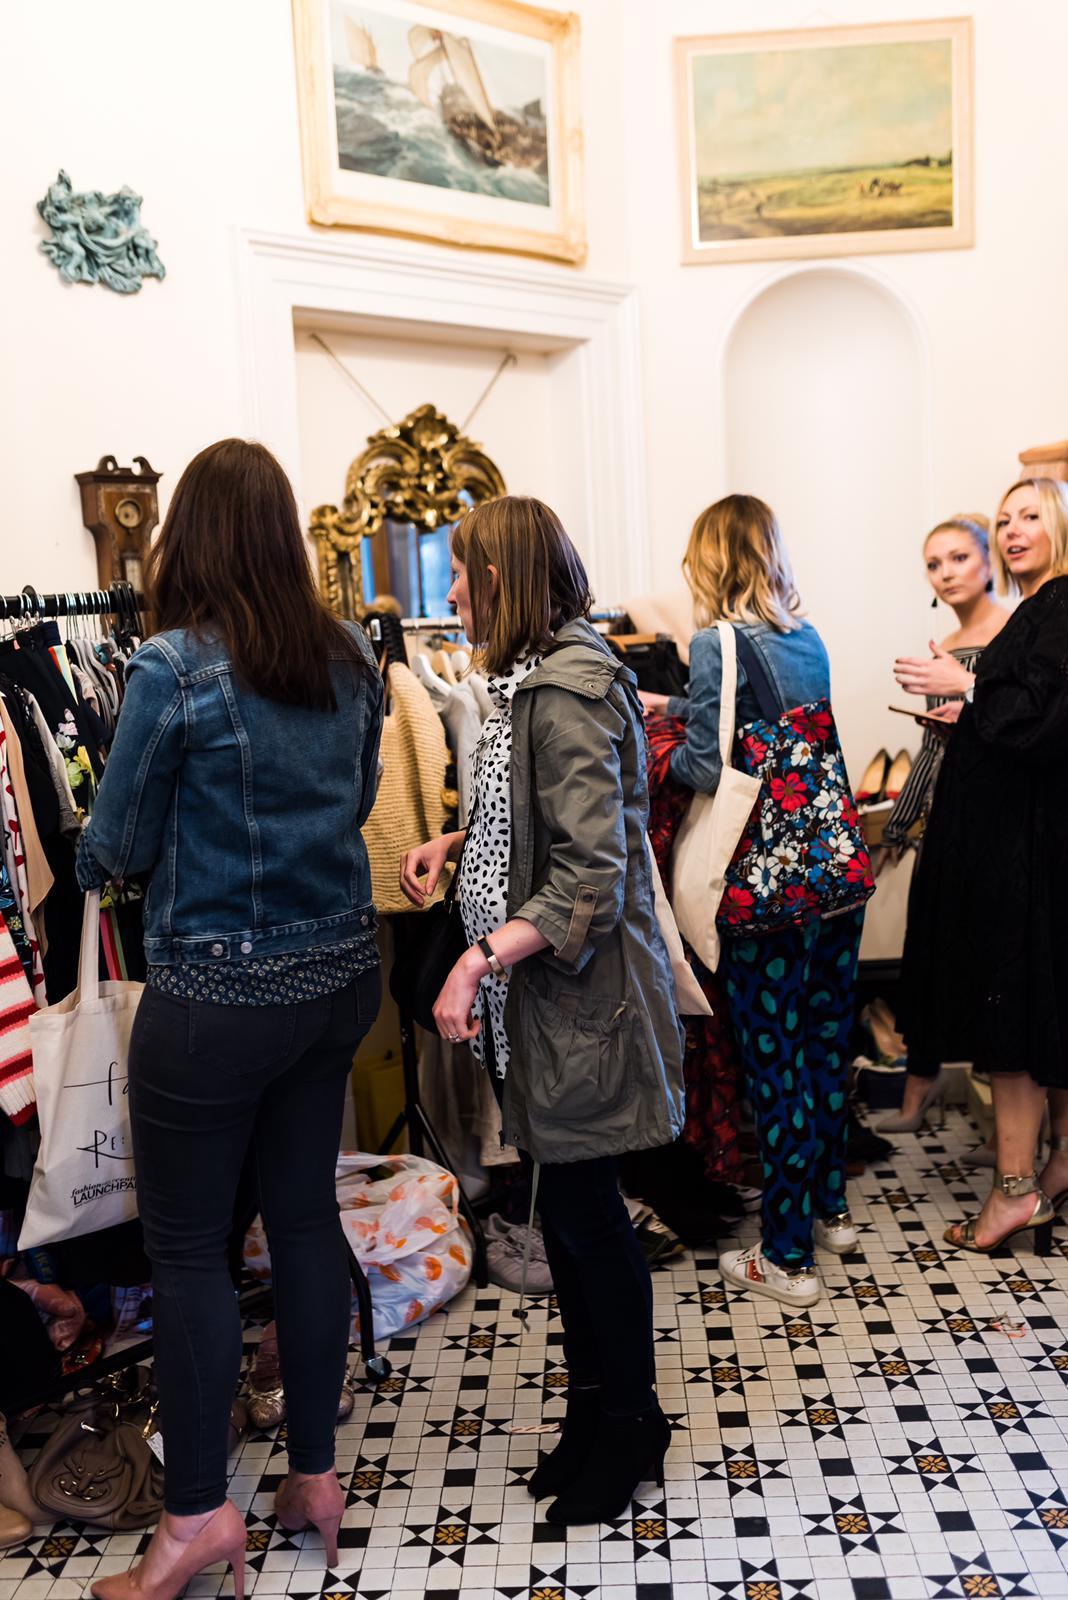 fashion-reboot-mums-the-word-event-tunbridge-wells-kent-support-local-magazine.JPG-o.JPG